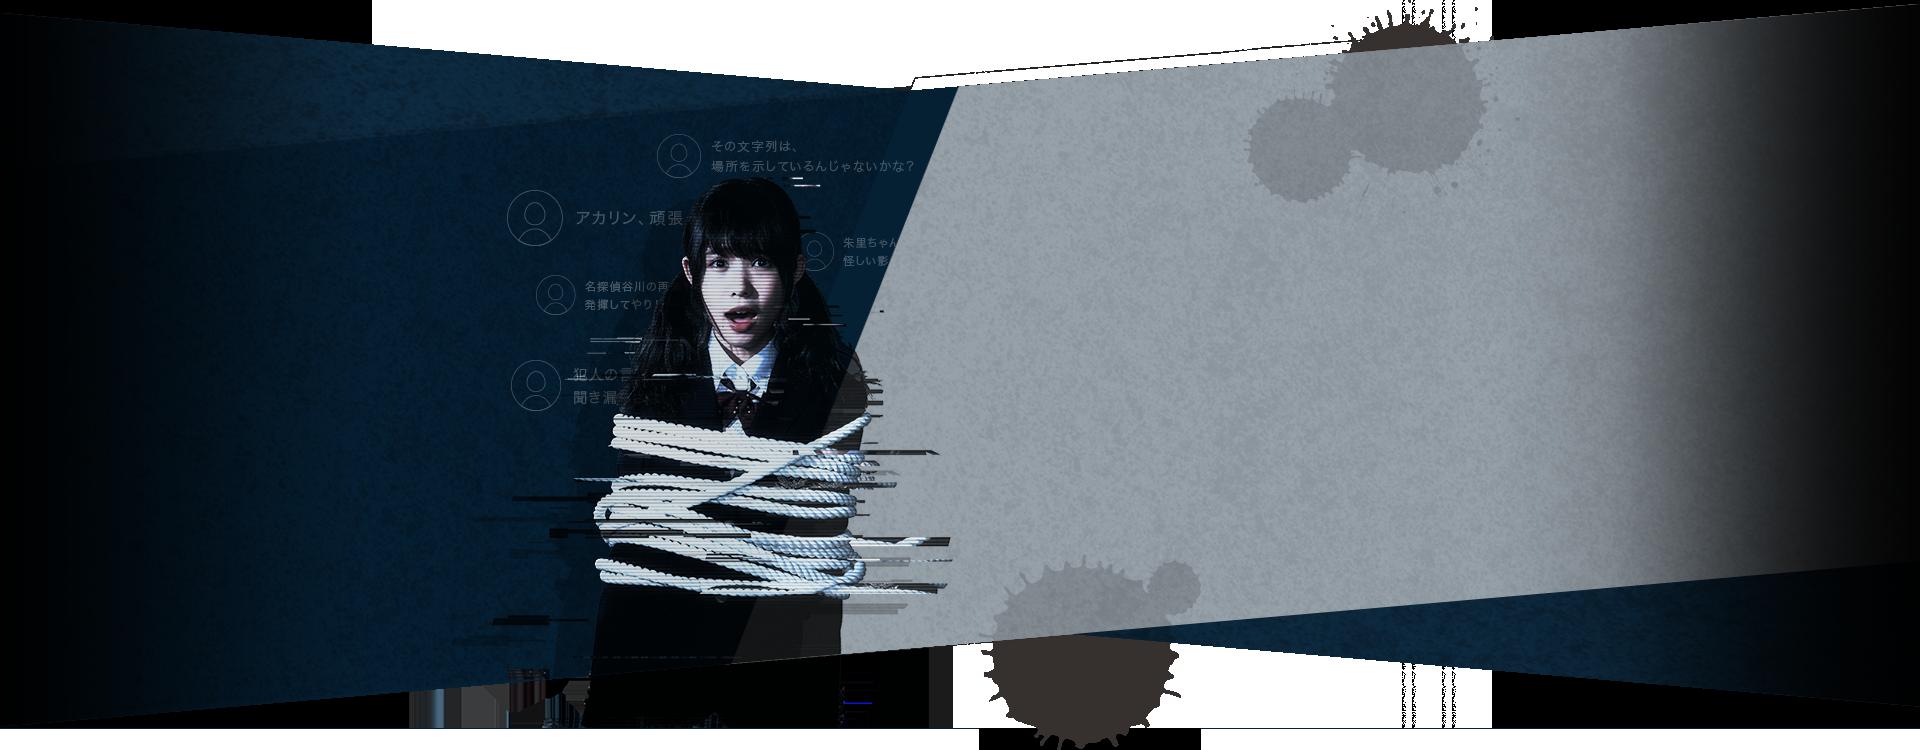 【NMB48】岩田桃夏応援スレ★3【ももるん】 YouTube動画>10本 dailymotion>1本 ->画像>564枚